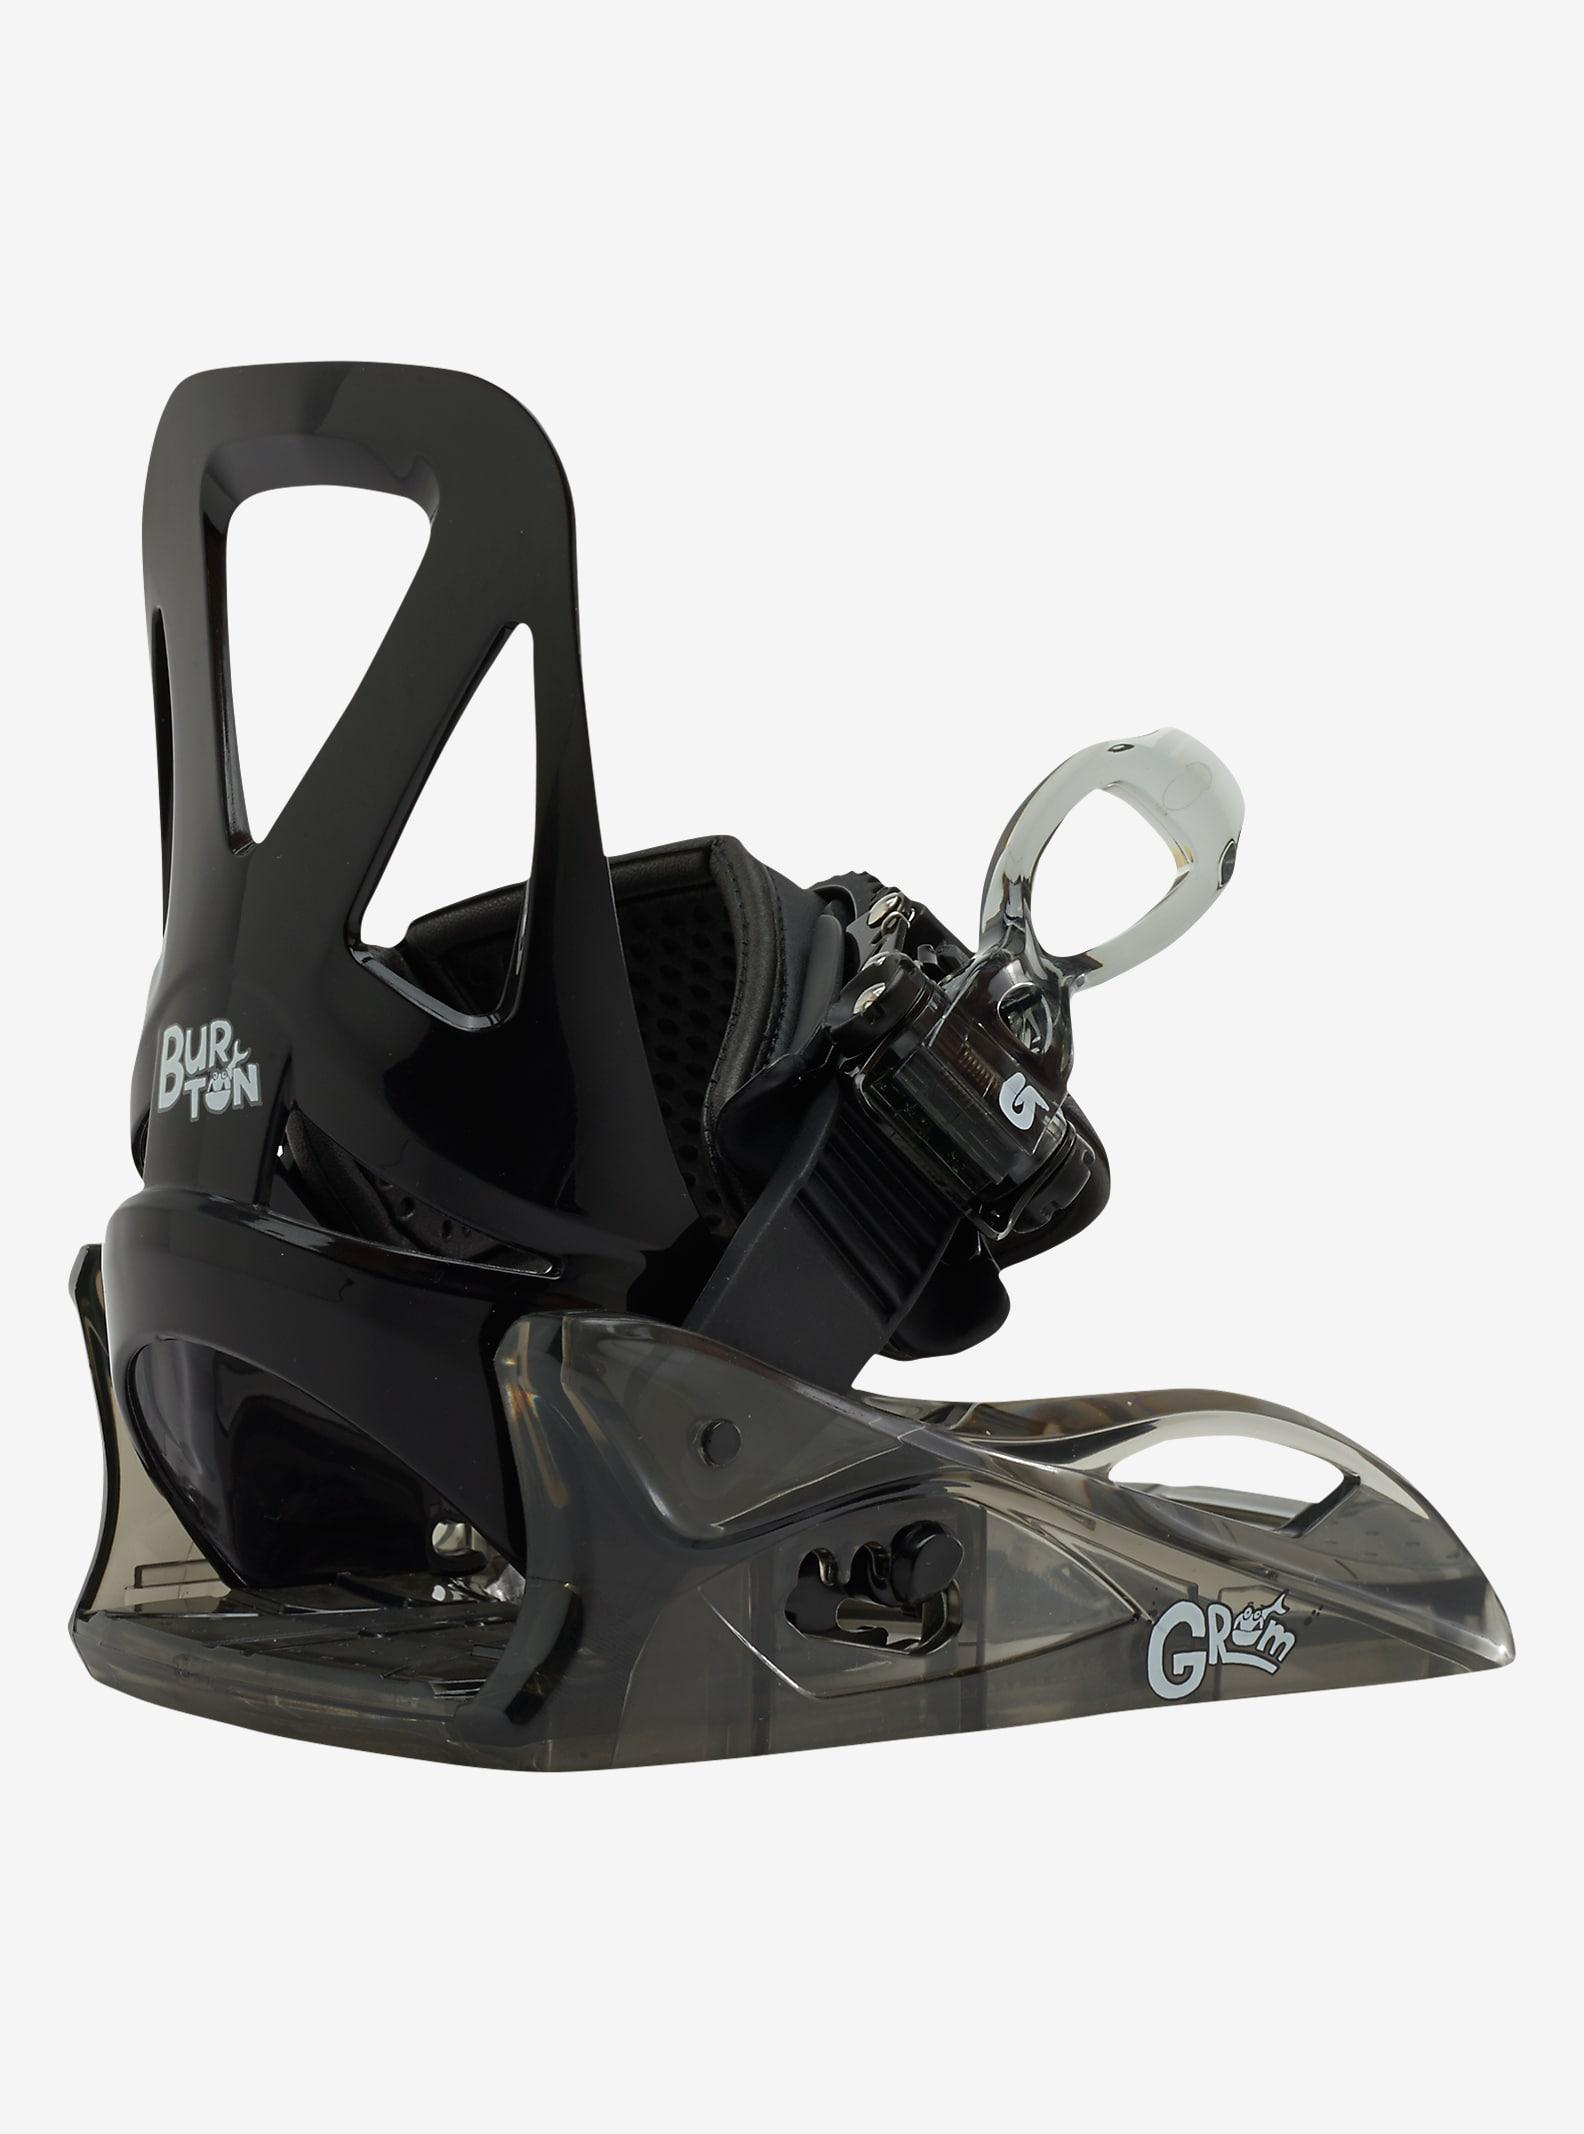 Burton Grom Snowboard Binding shown in Black